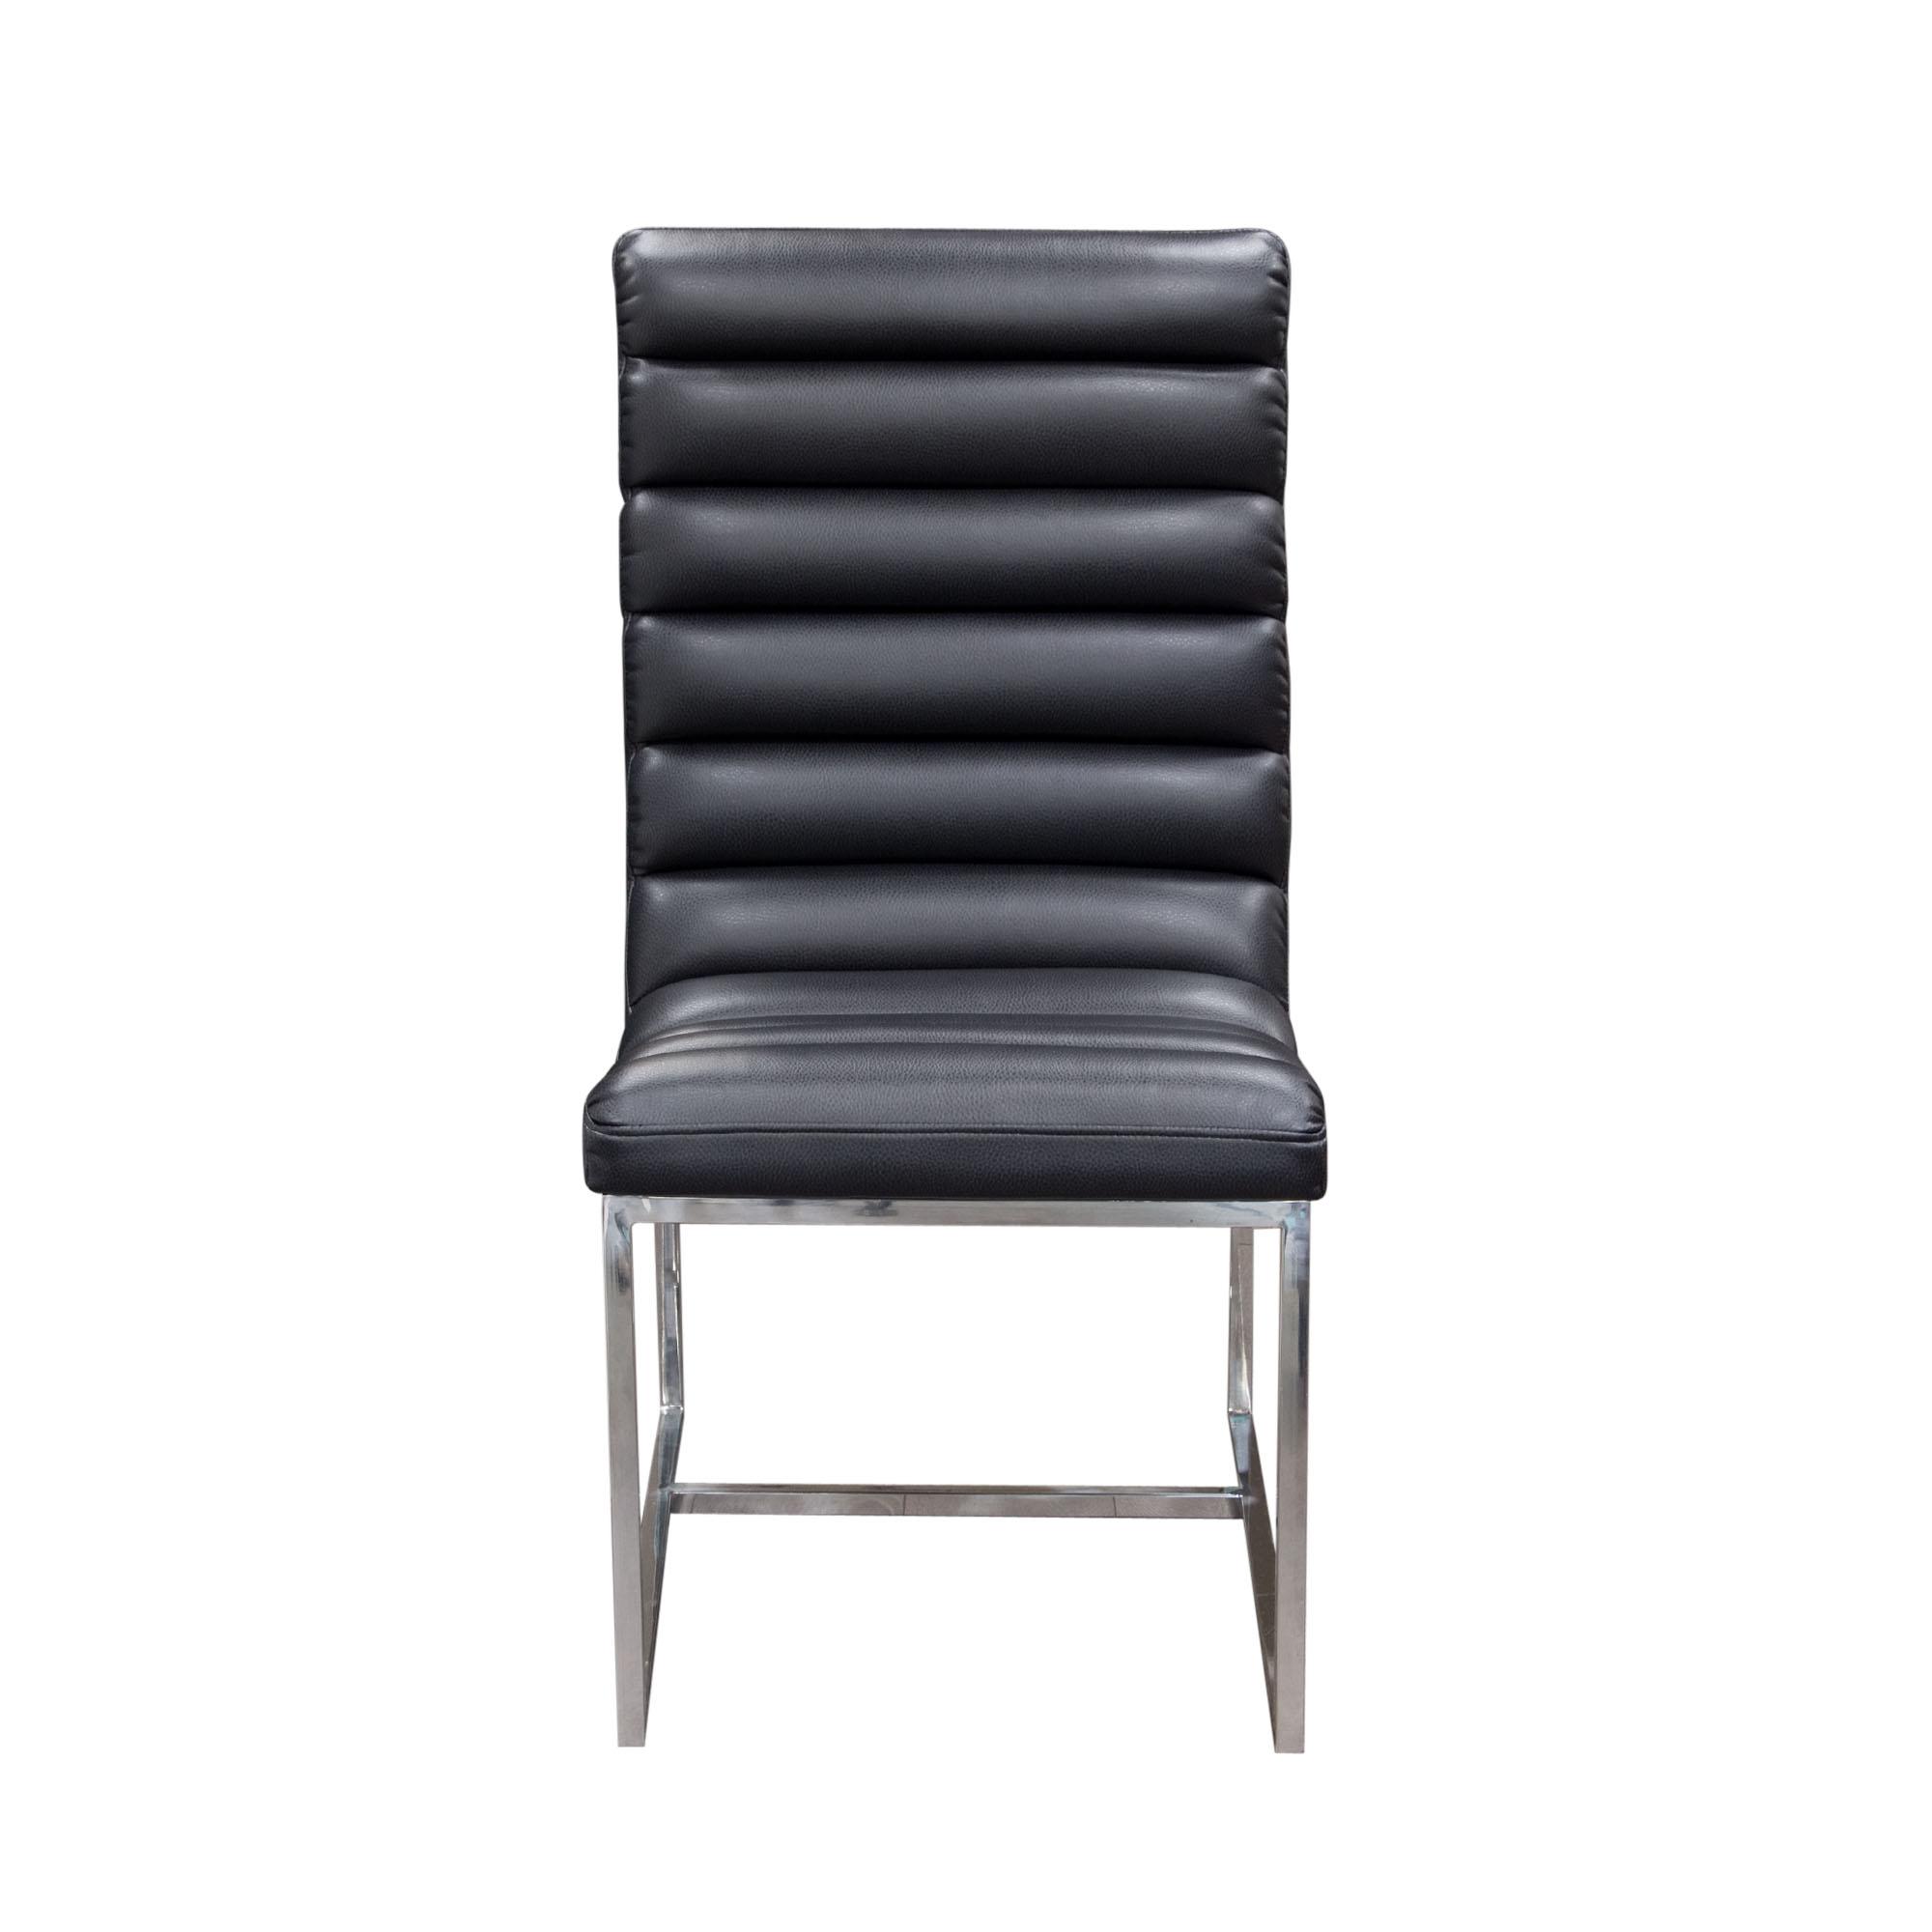 Diamond Sofa Bardot Black Set of Two Dining Side Chairs - Item Number: BARDOTDCBL2